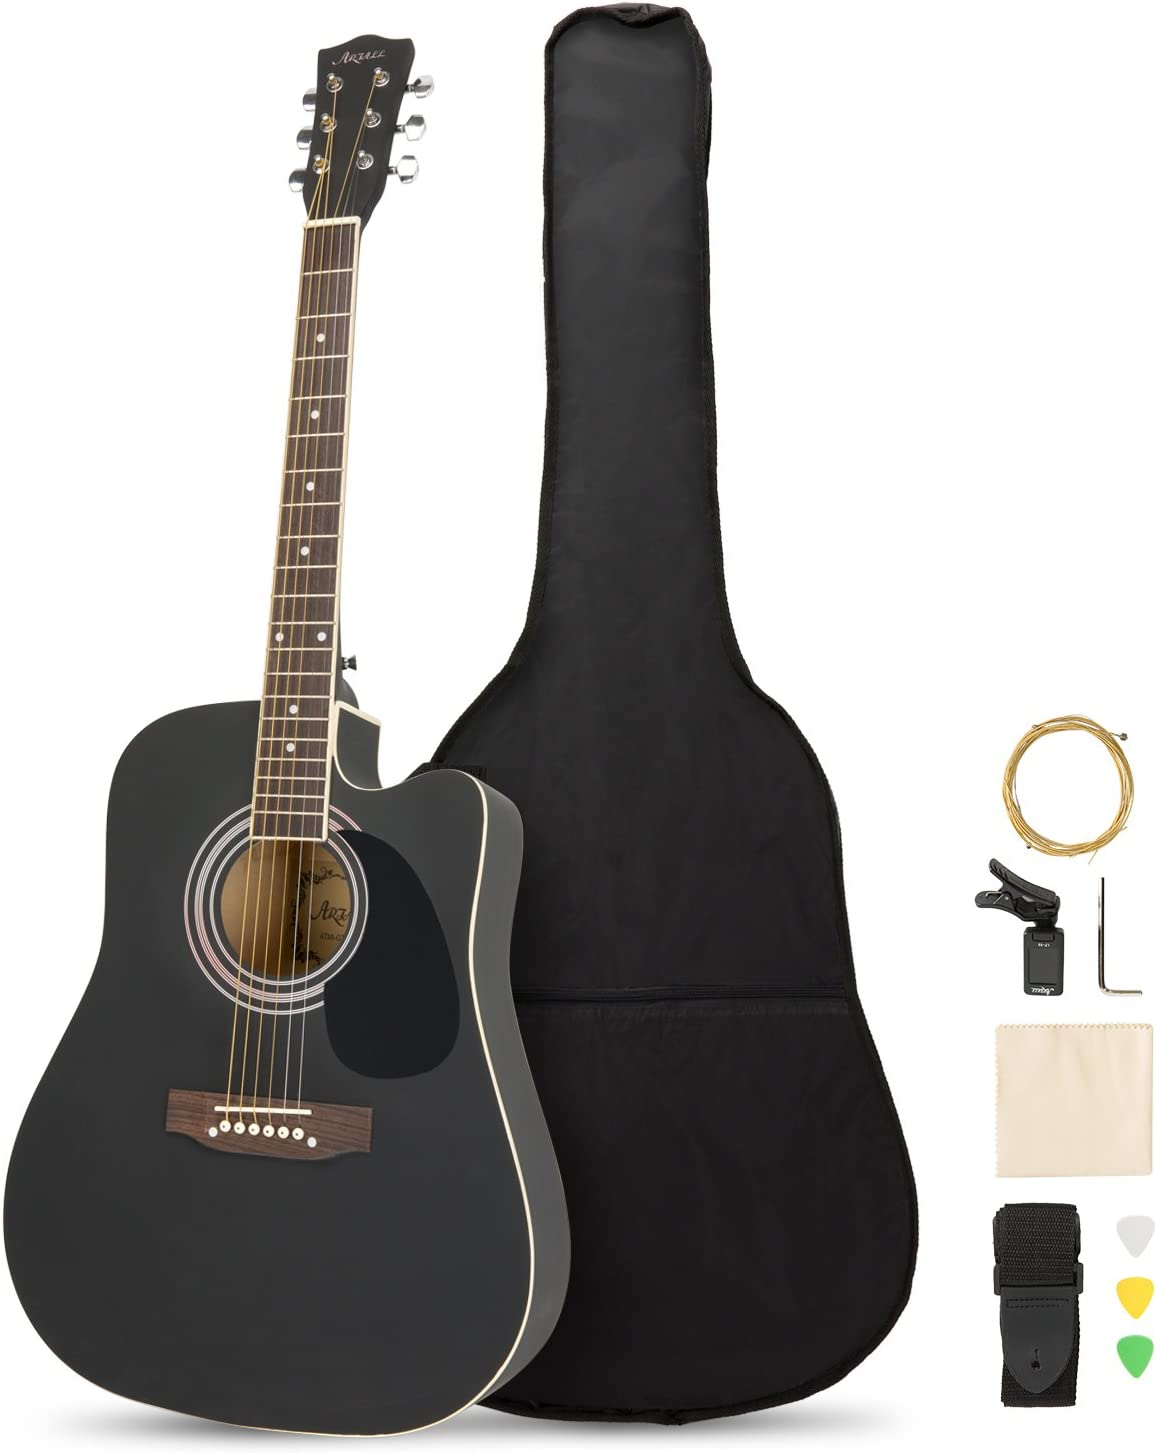 ARTALL 104 cm Equipo para principiantes de guitarra recortada acústica de madera maciza hecha a mano con funda, afinador, cuerdas, selecciones, correa, negro mate